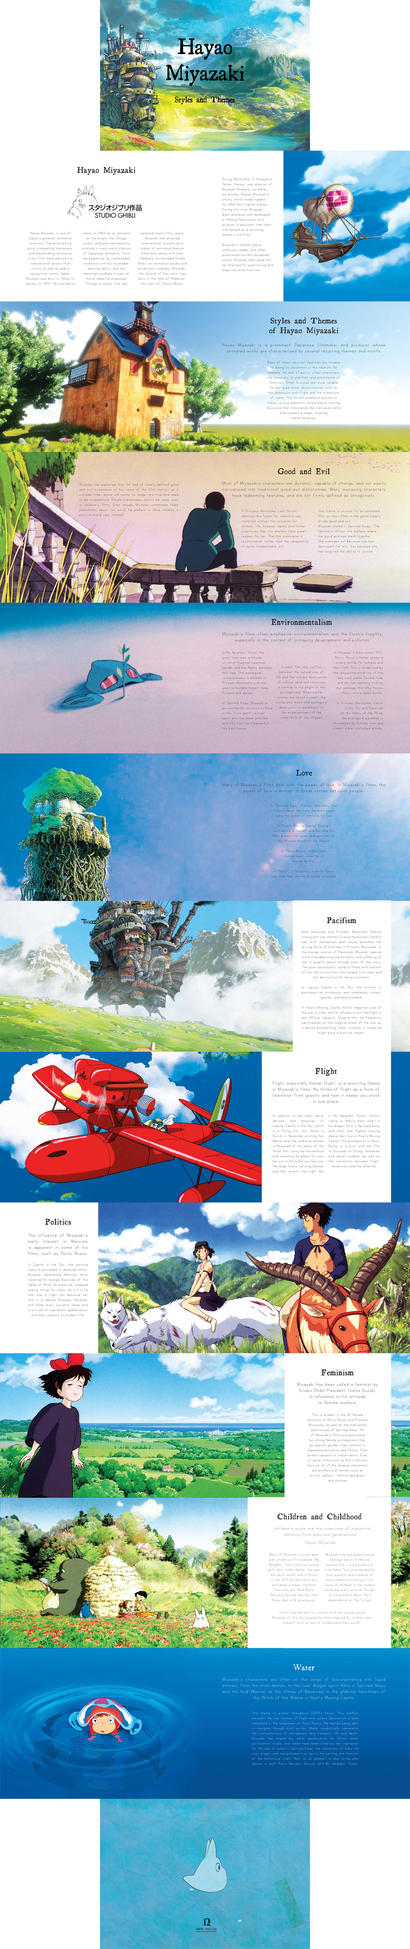 Hayao Miyazaki's brochure by RainiiDays